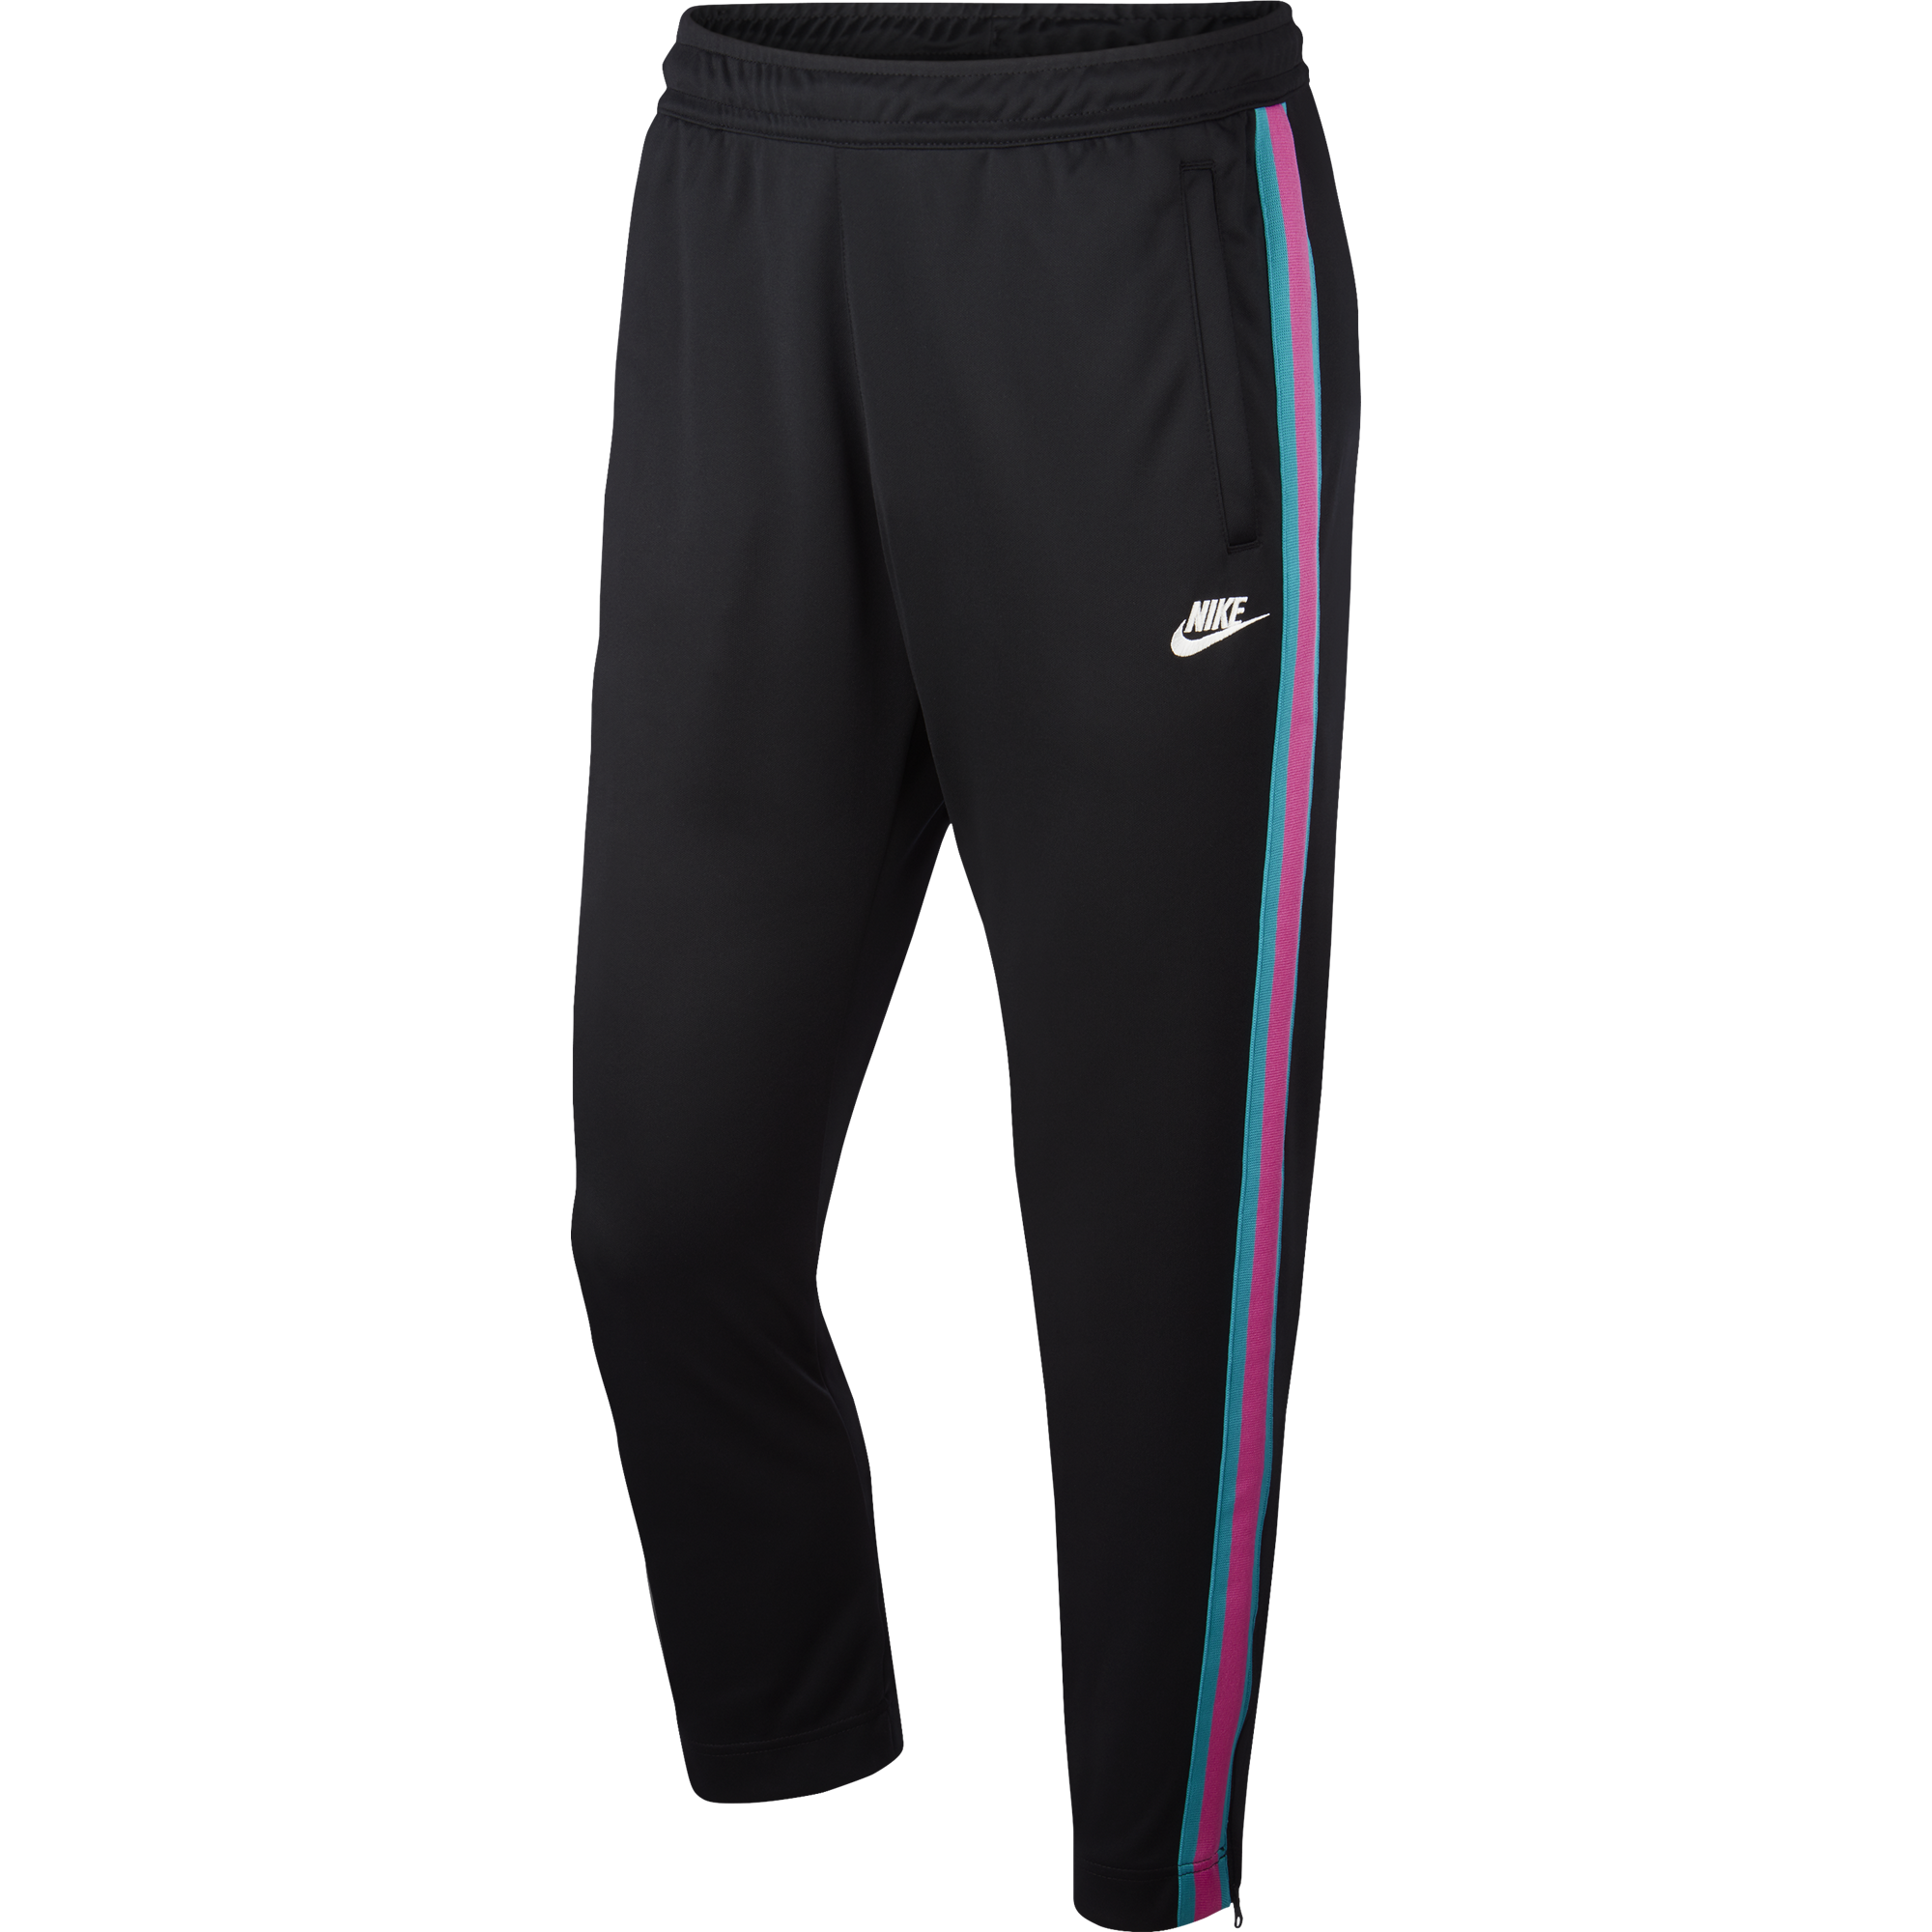 1d421d2c703c Nike Tribute OH Track Pant - Black Spirit Teal-Sail